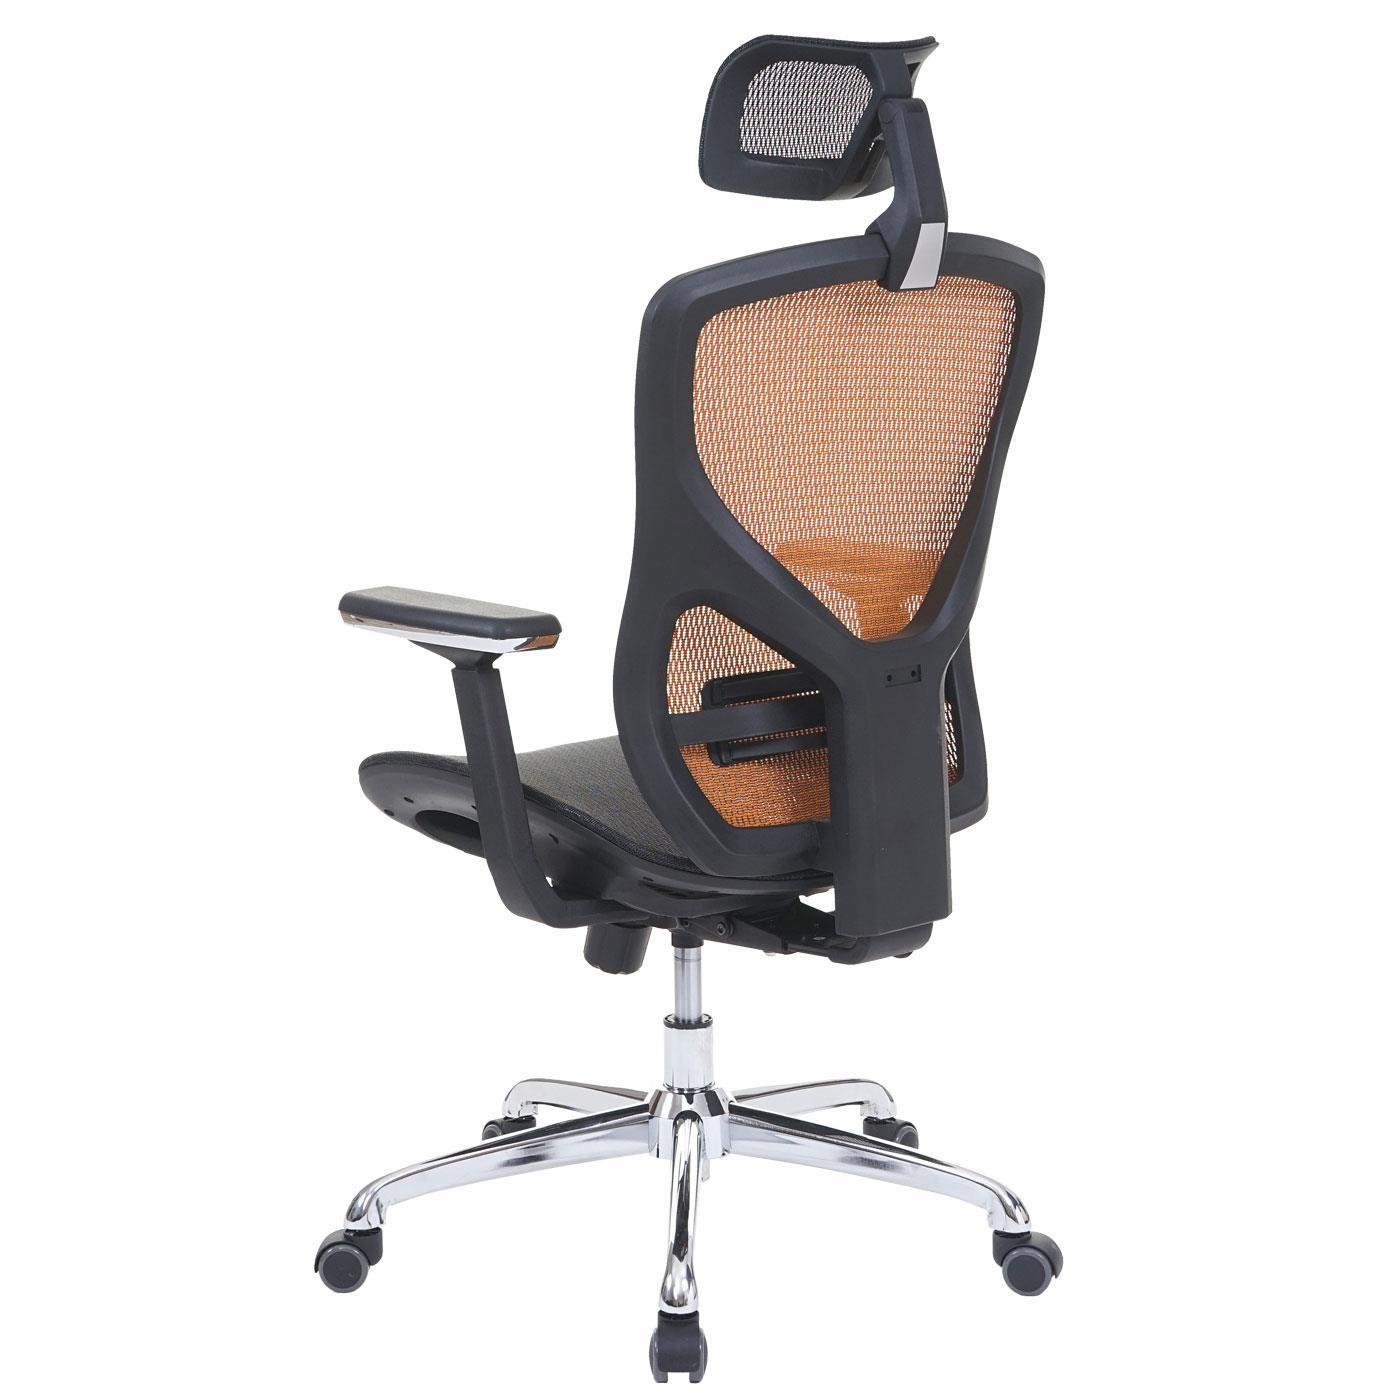 Sedia ergonomica LAMBI, Completamente Regolabile, Supporto ...